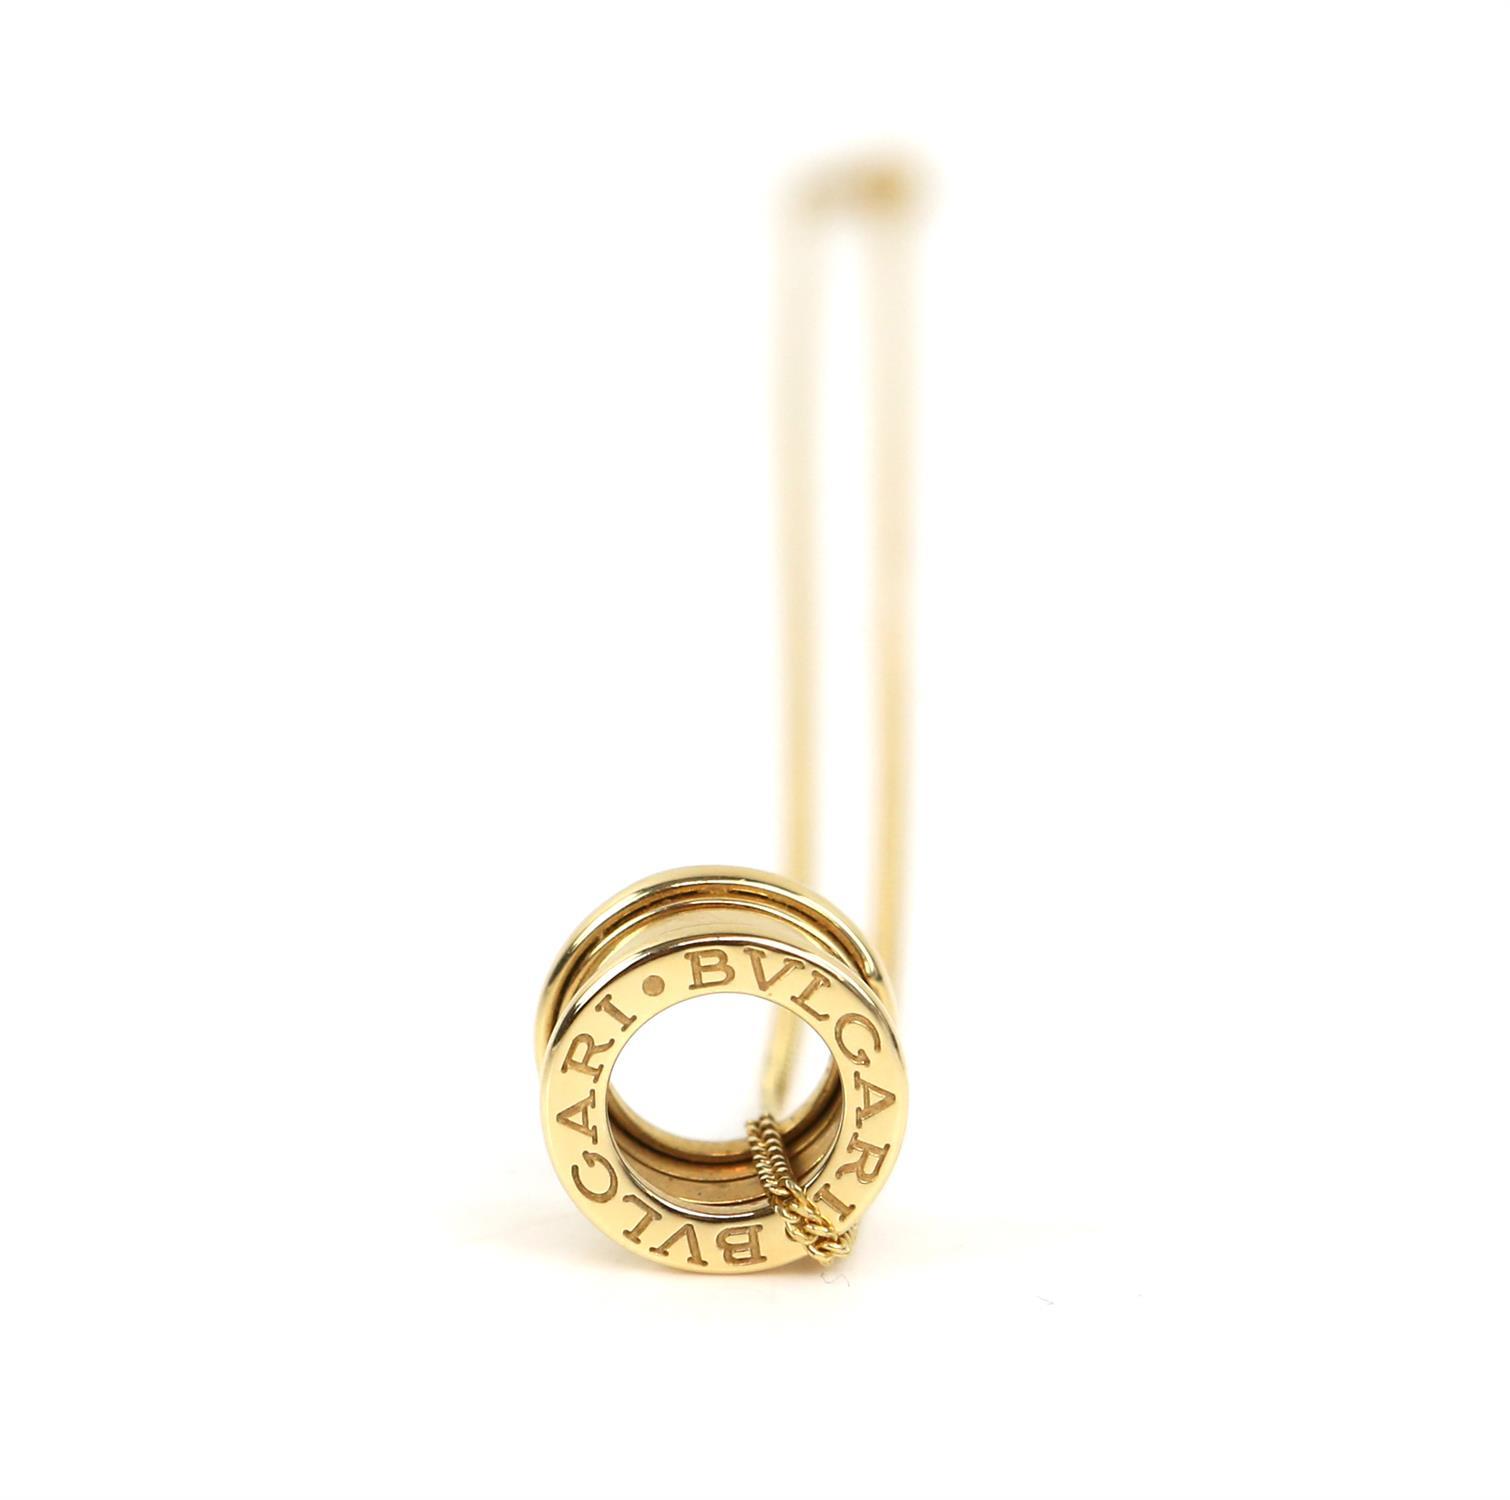 Bvlgari B.Zero1 small round pendant, in 18 ct yellow gold, marked Made in Italy 750 with Bvlgari